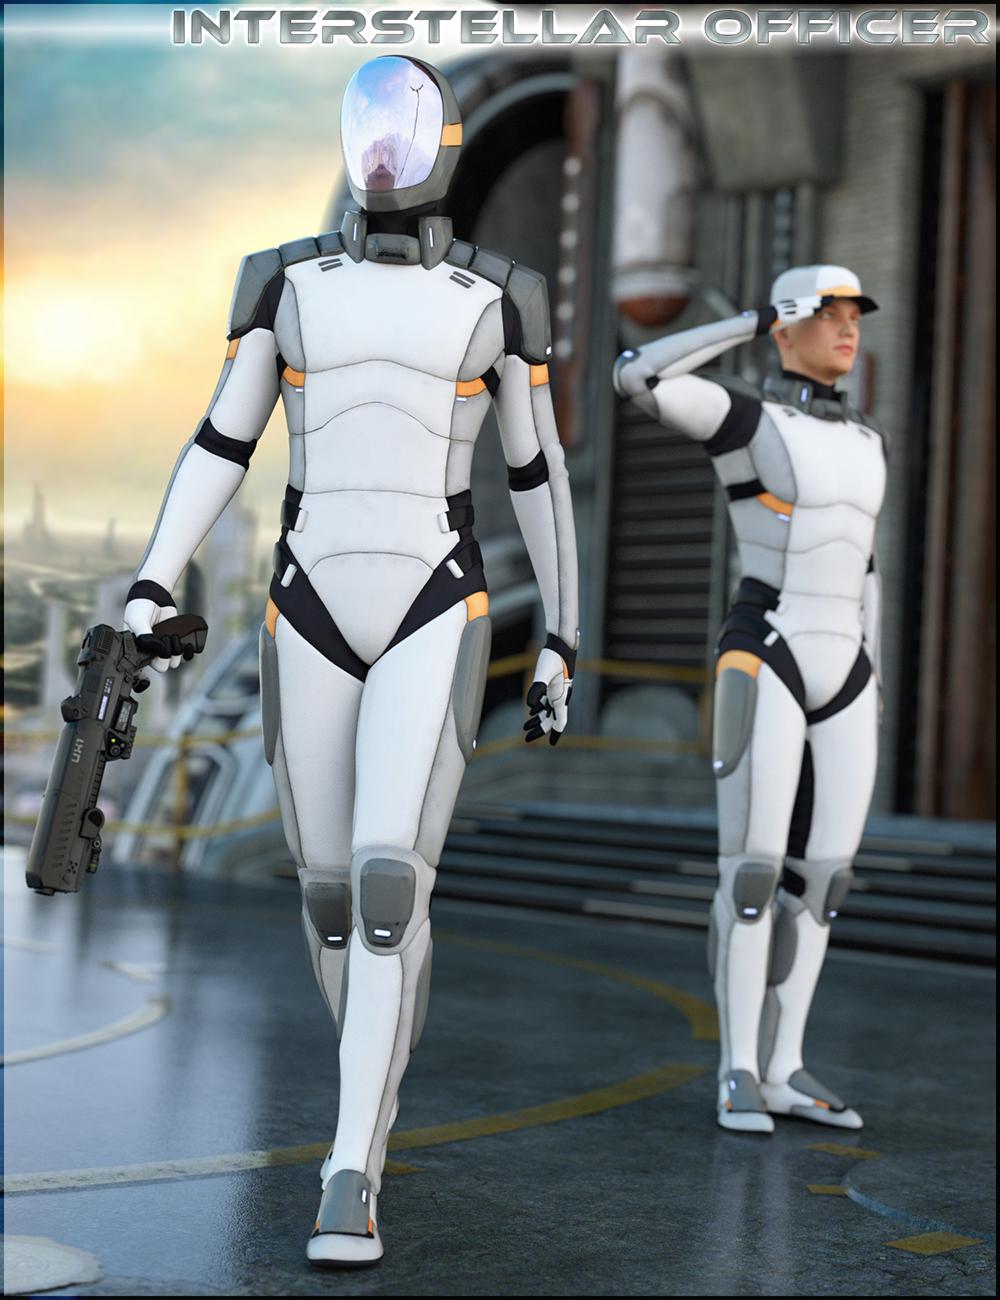 HFS Interstellar Officer for Genesis 3 Male(s) by: DarioFish, 3D Models by Daz 3D